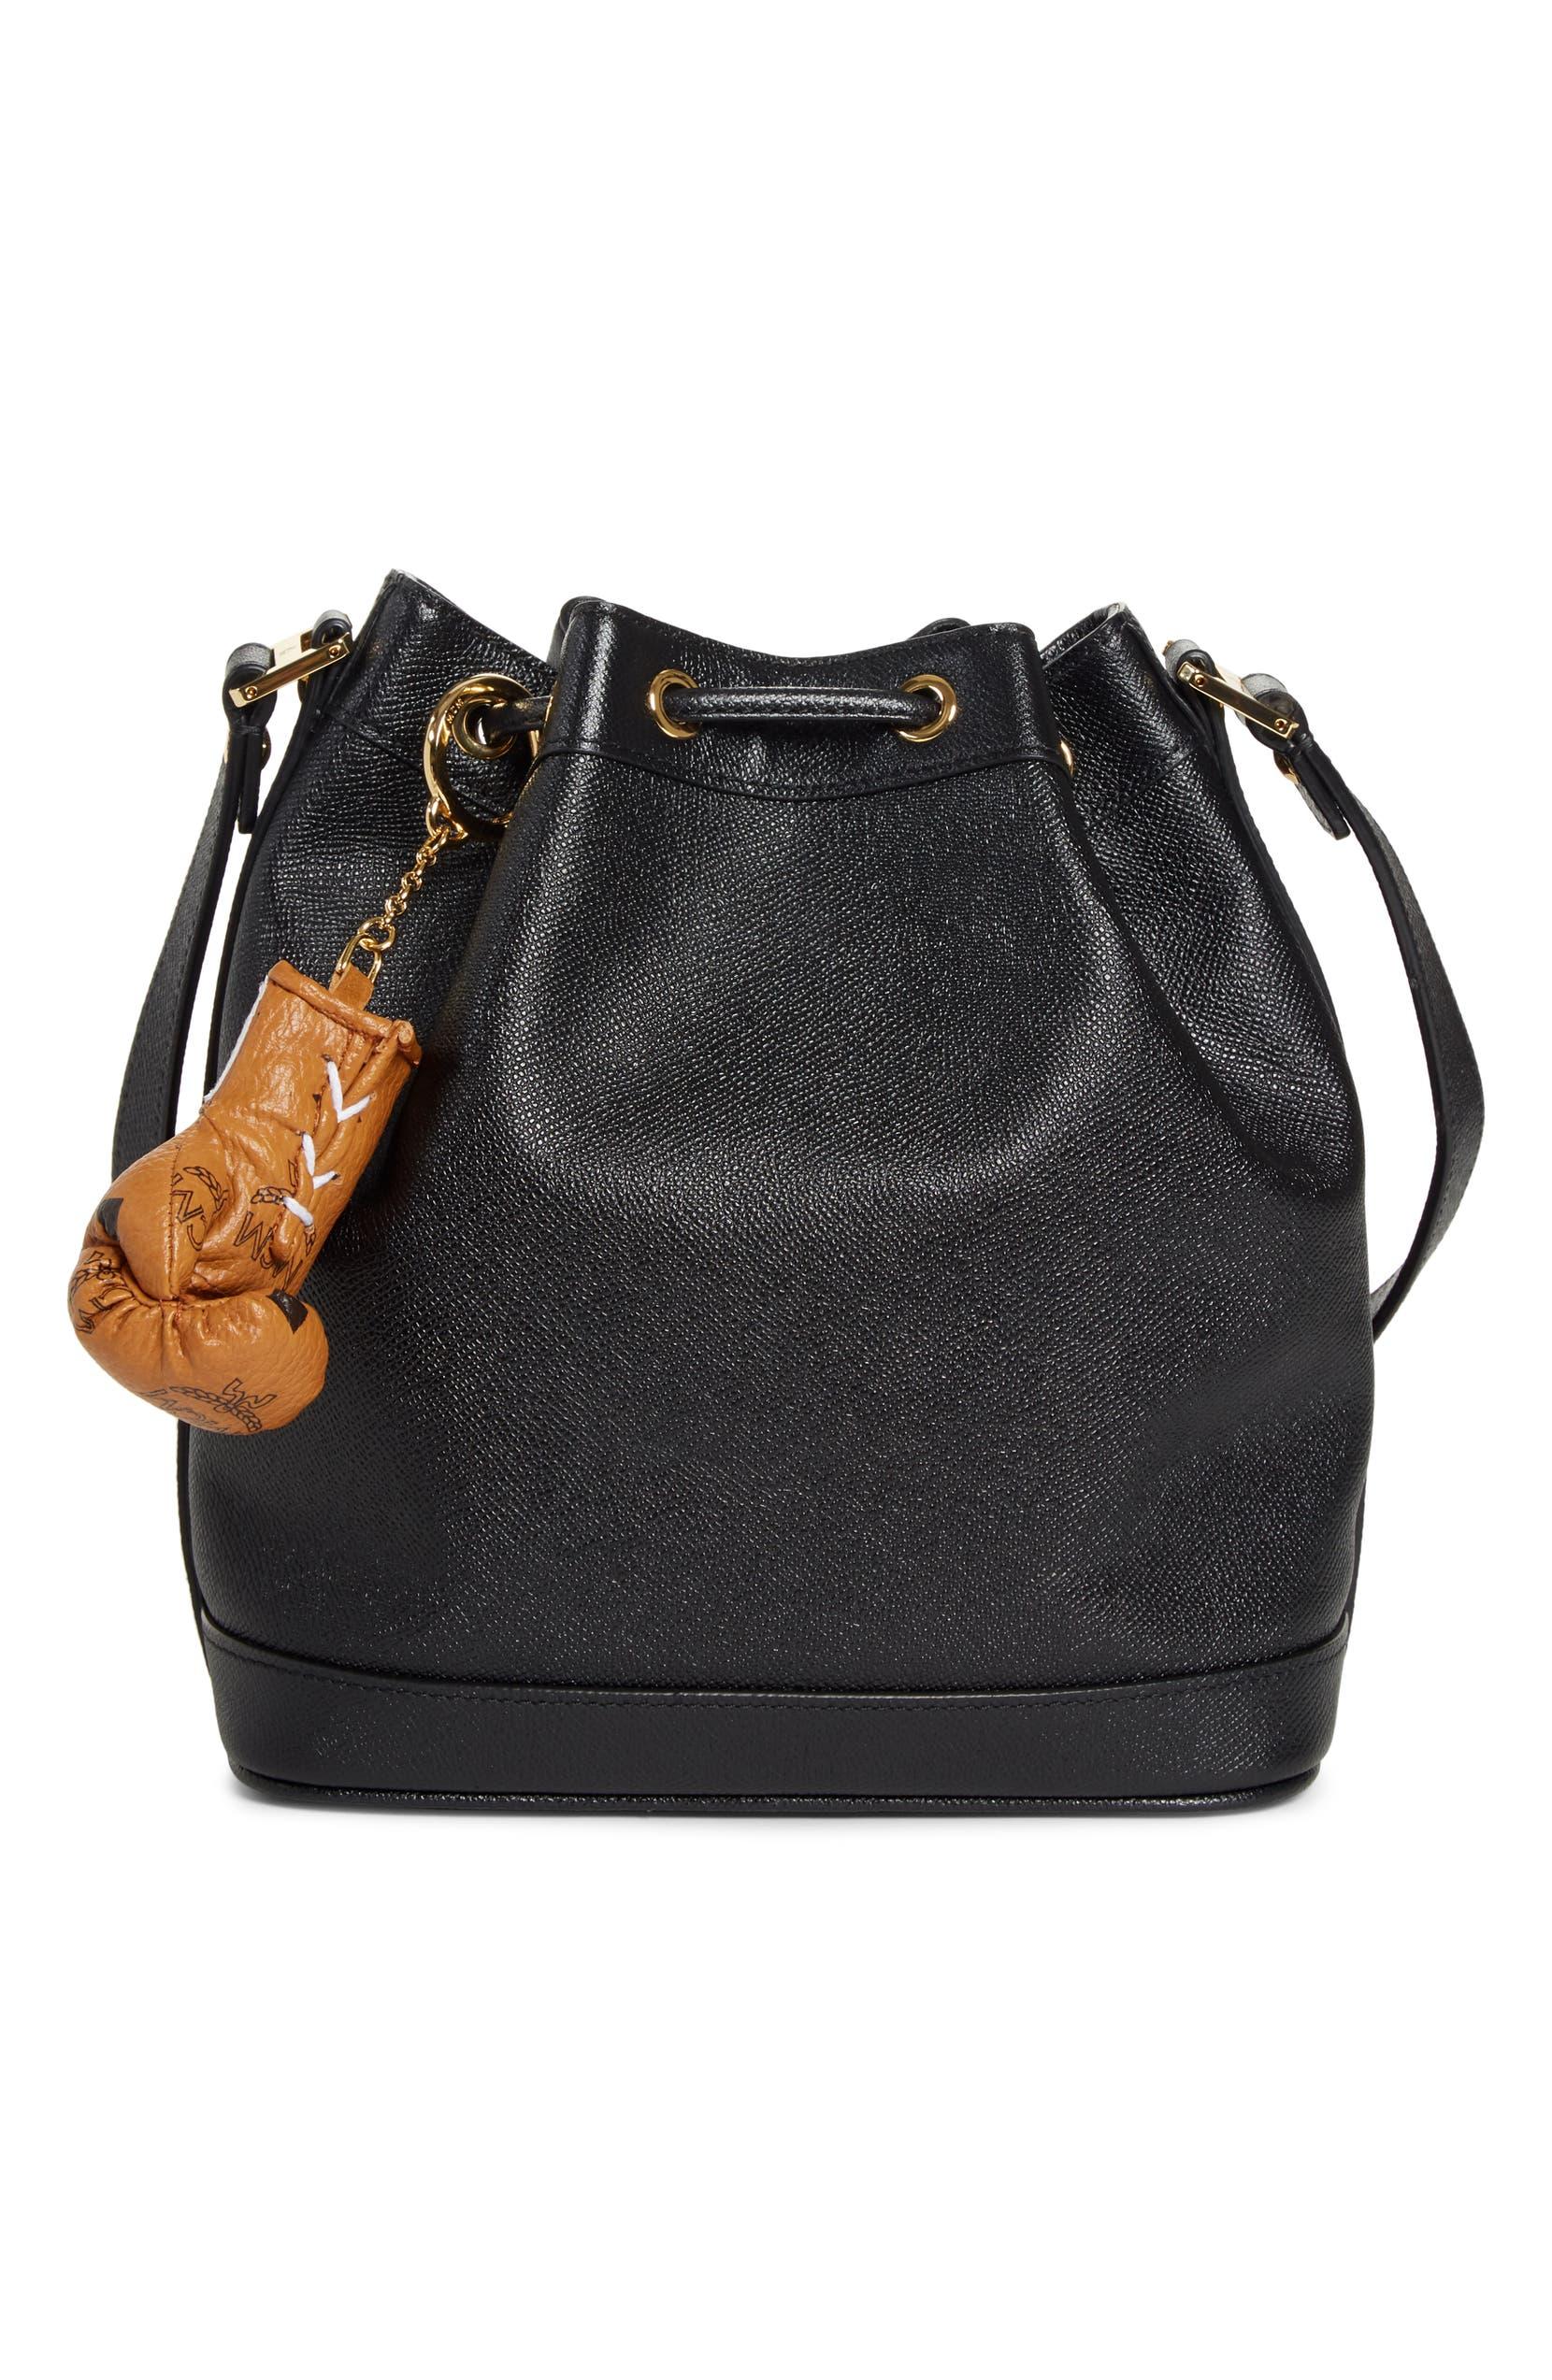 2316452dae4 Everlast x MCM Mini Visetos Coated Canvas Glove Bag Charm   Nordstrom